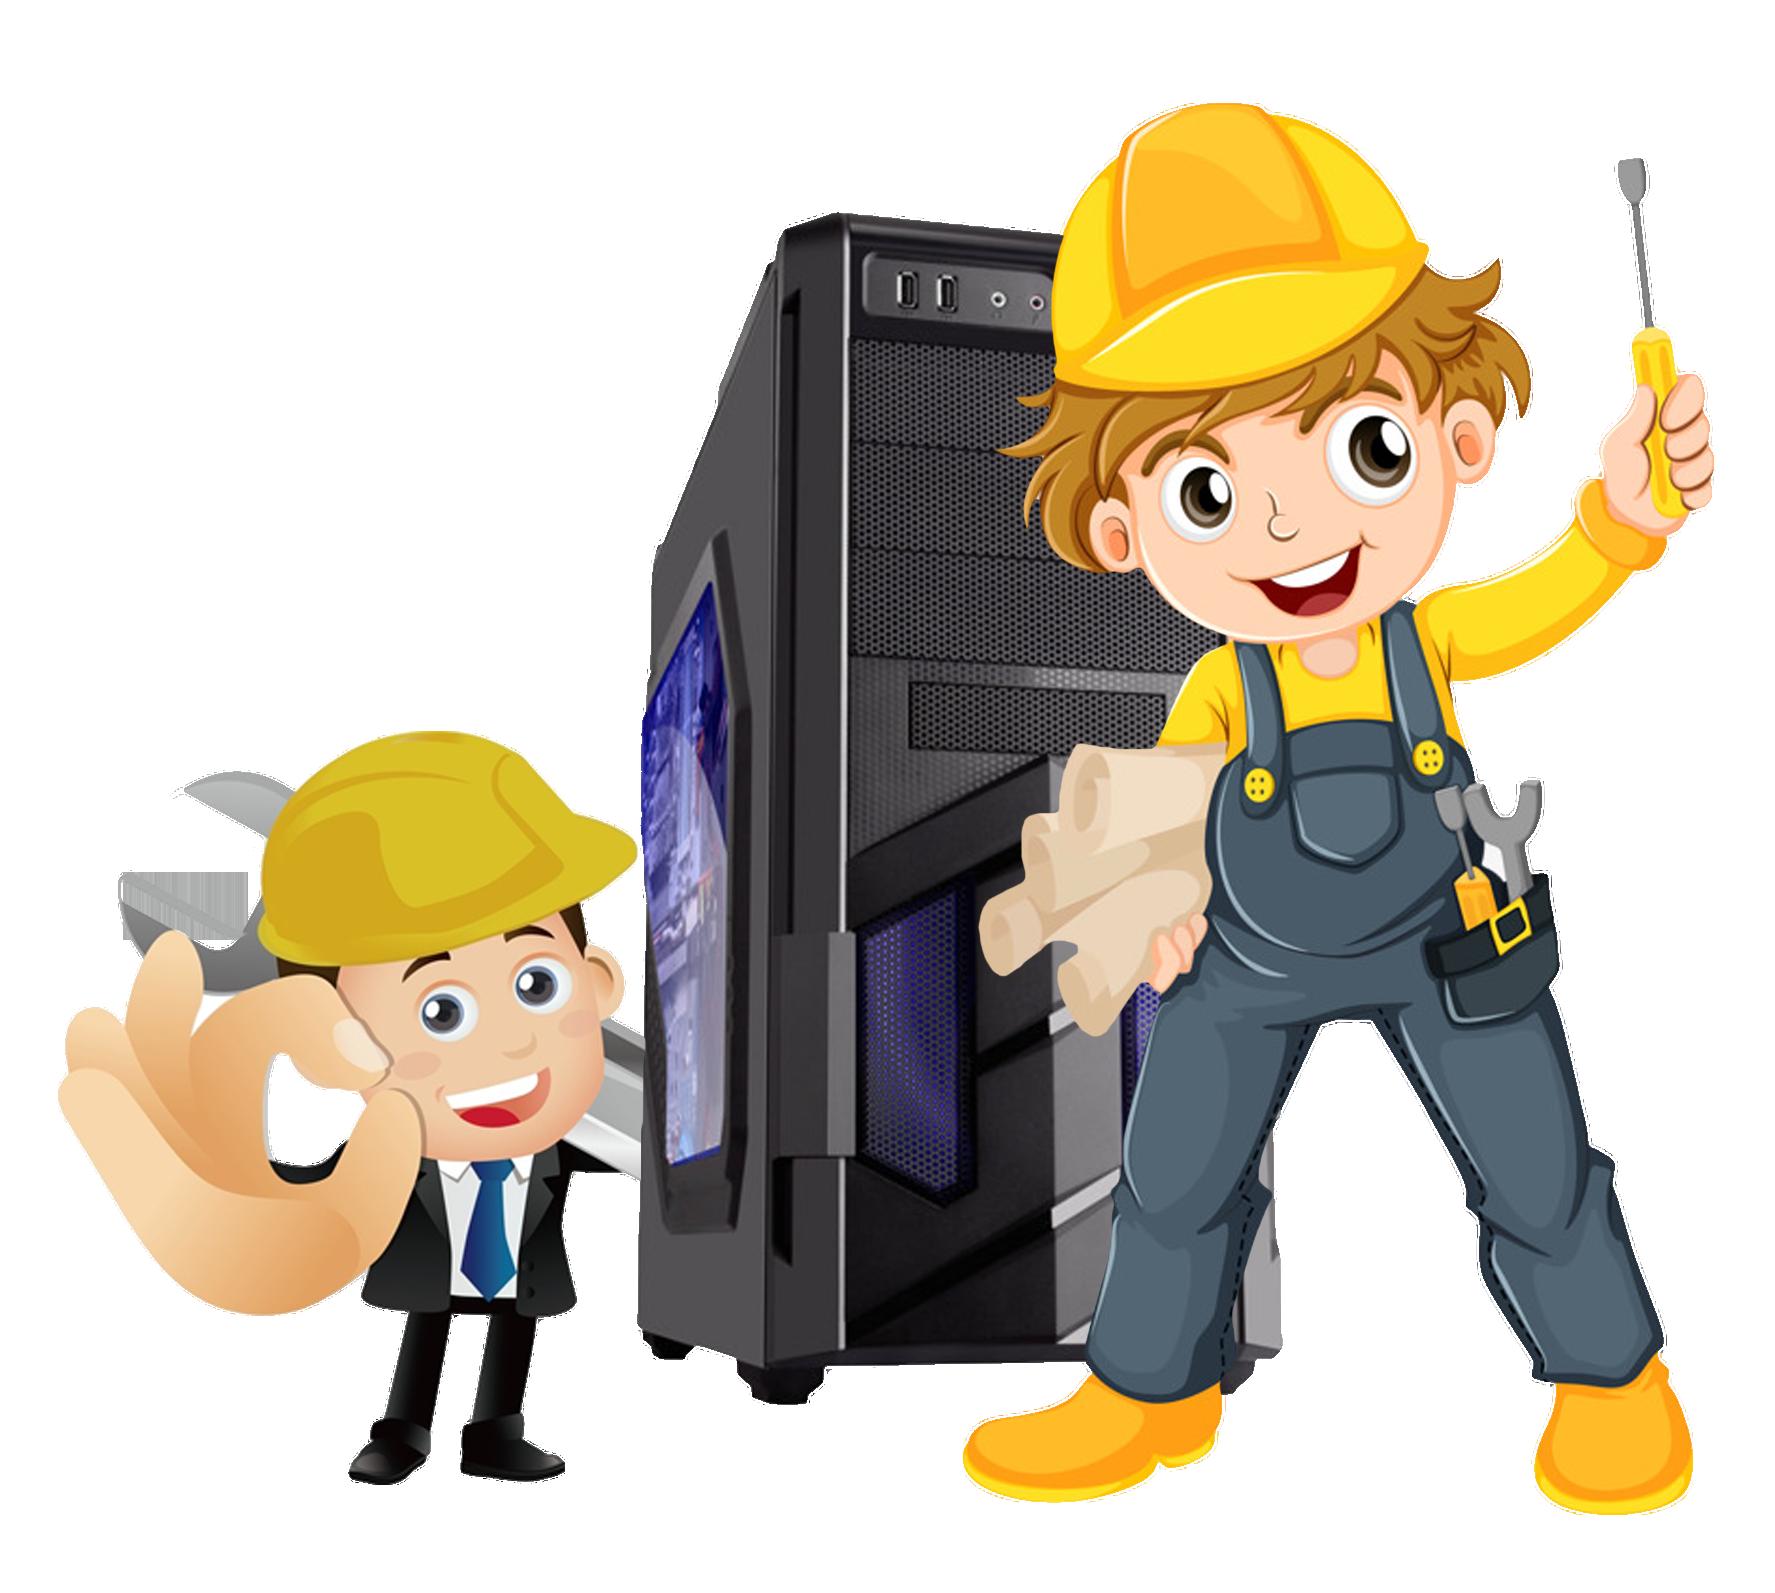 Laptop cartoon file maintenance. Computer clipart character